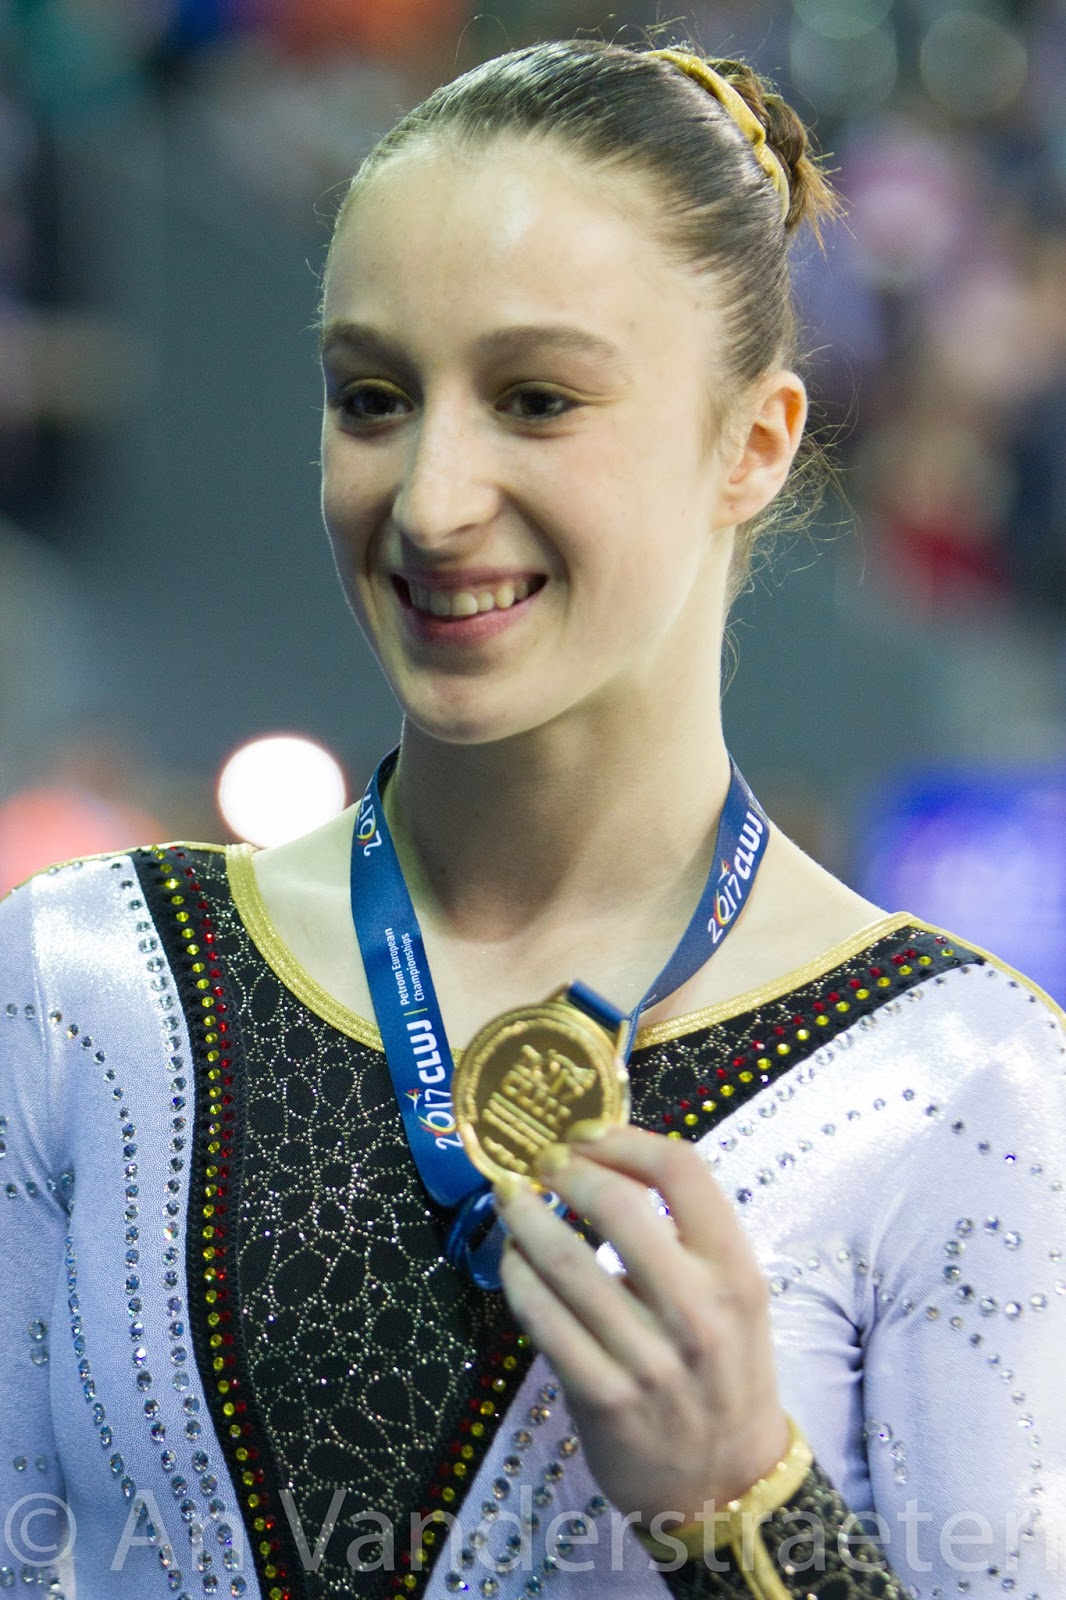 Belgian gymnastics 2017 european championships nina